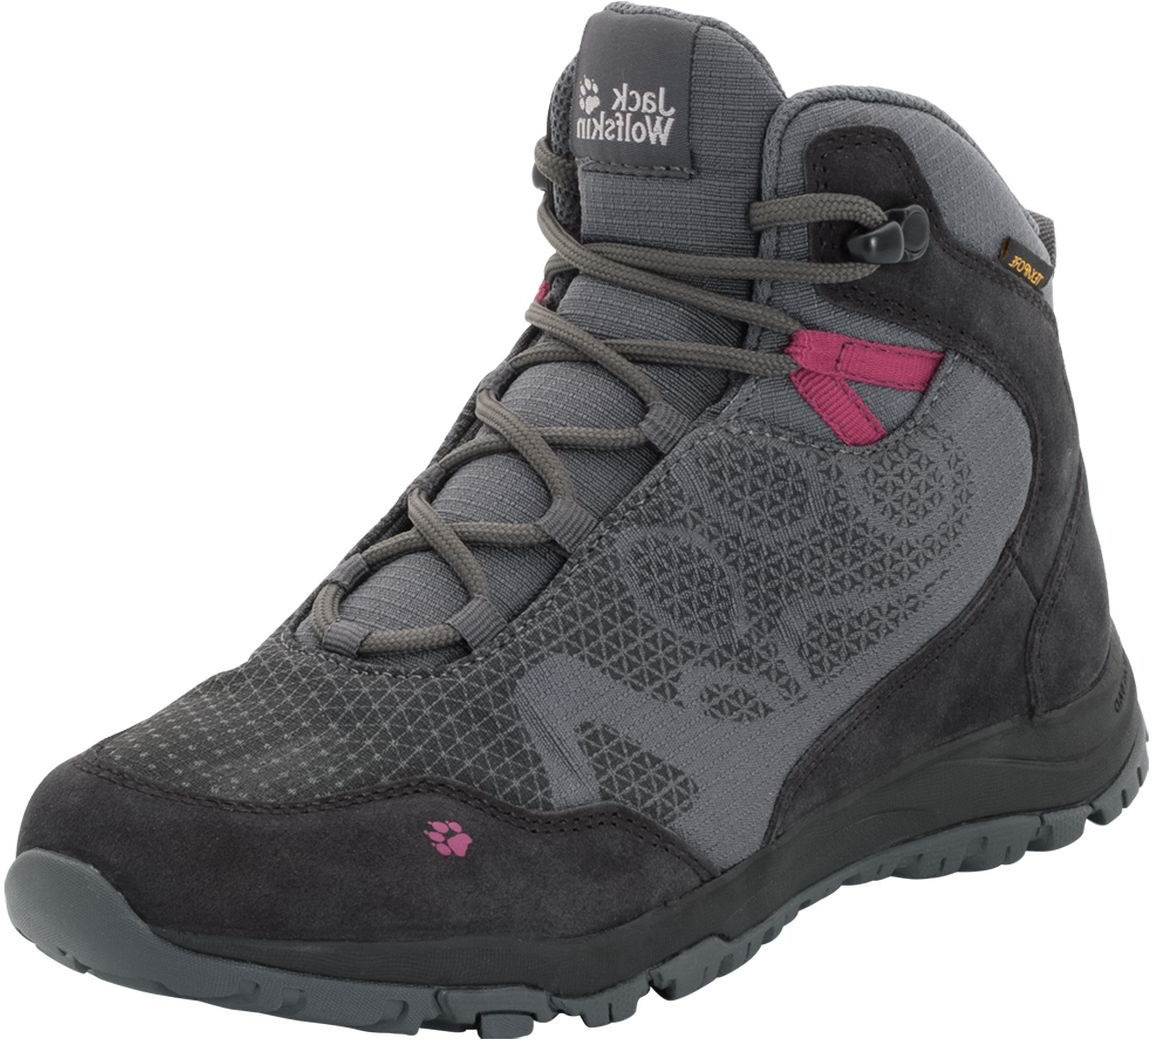 Ботинки Jack Wolfskin Activate Xt Texapore Mid W цена